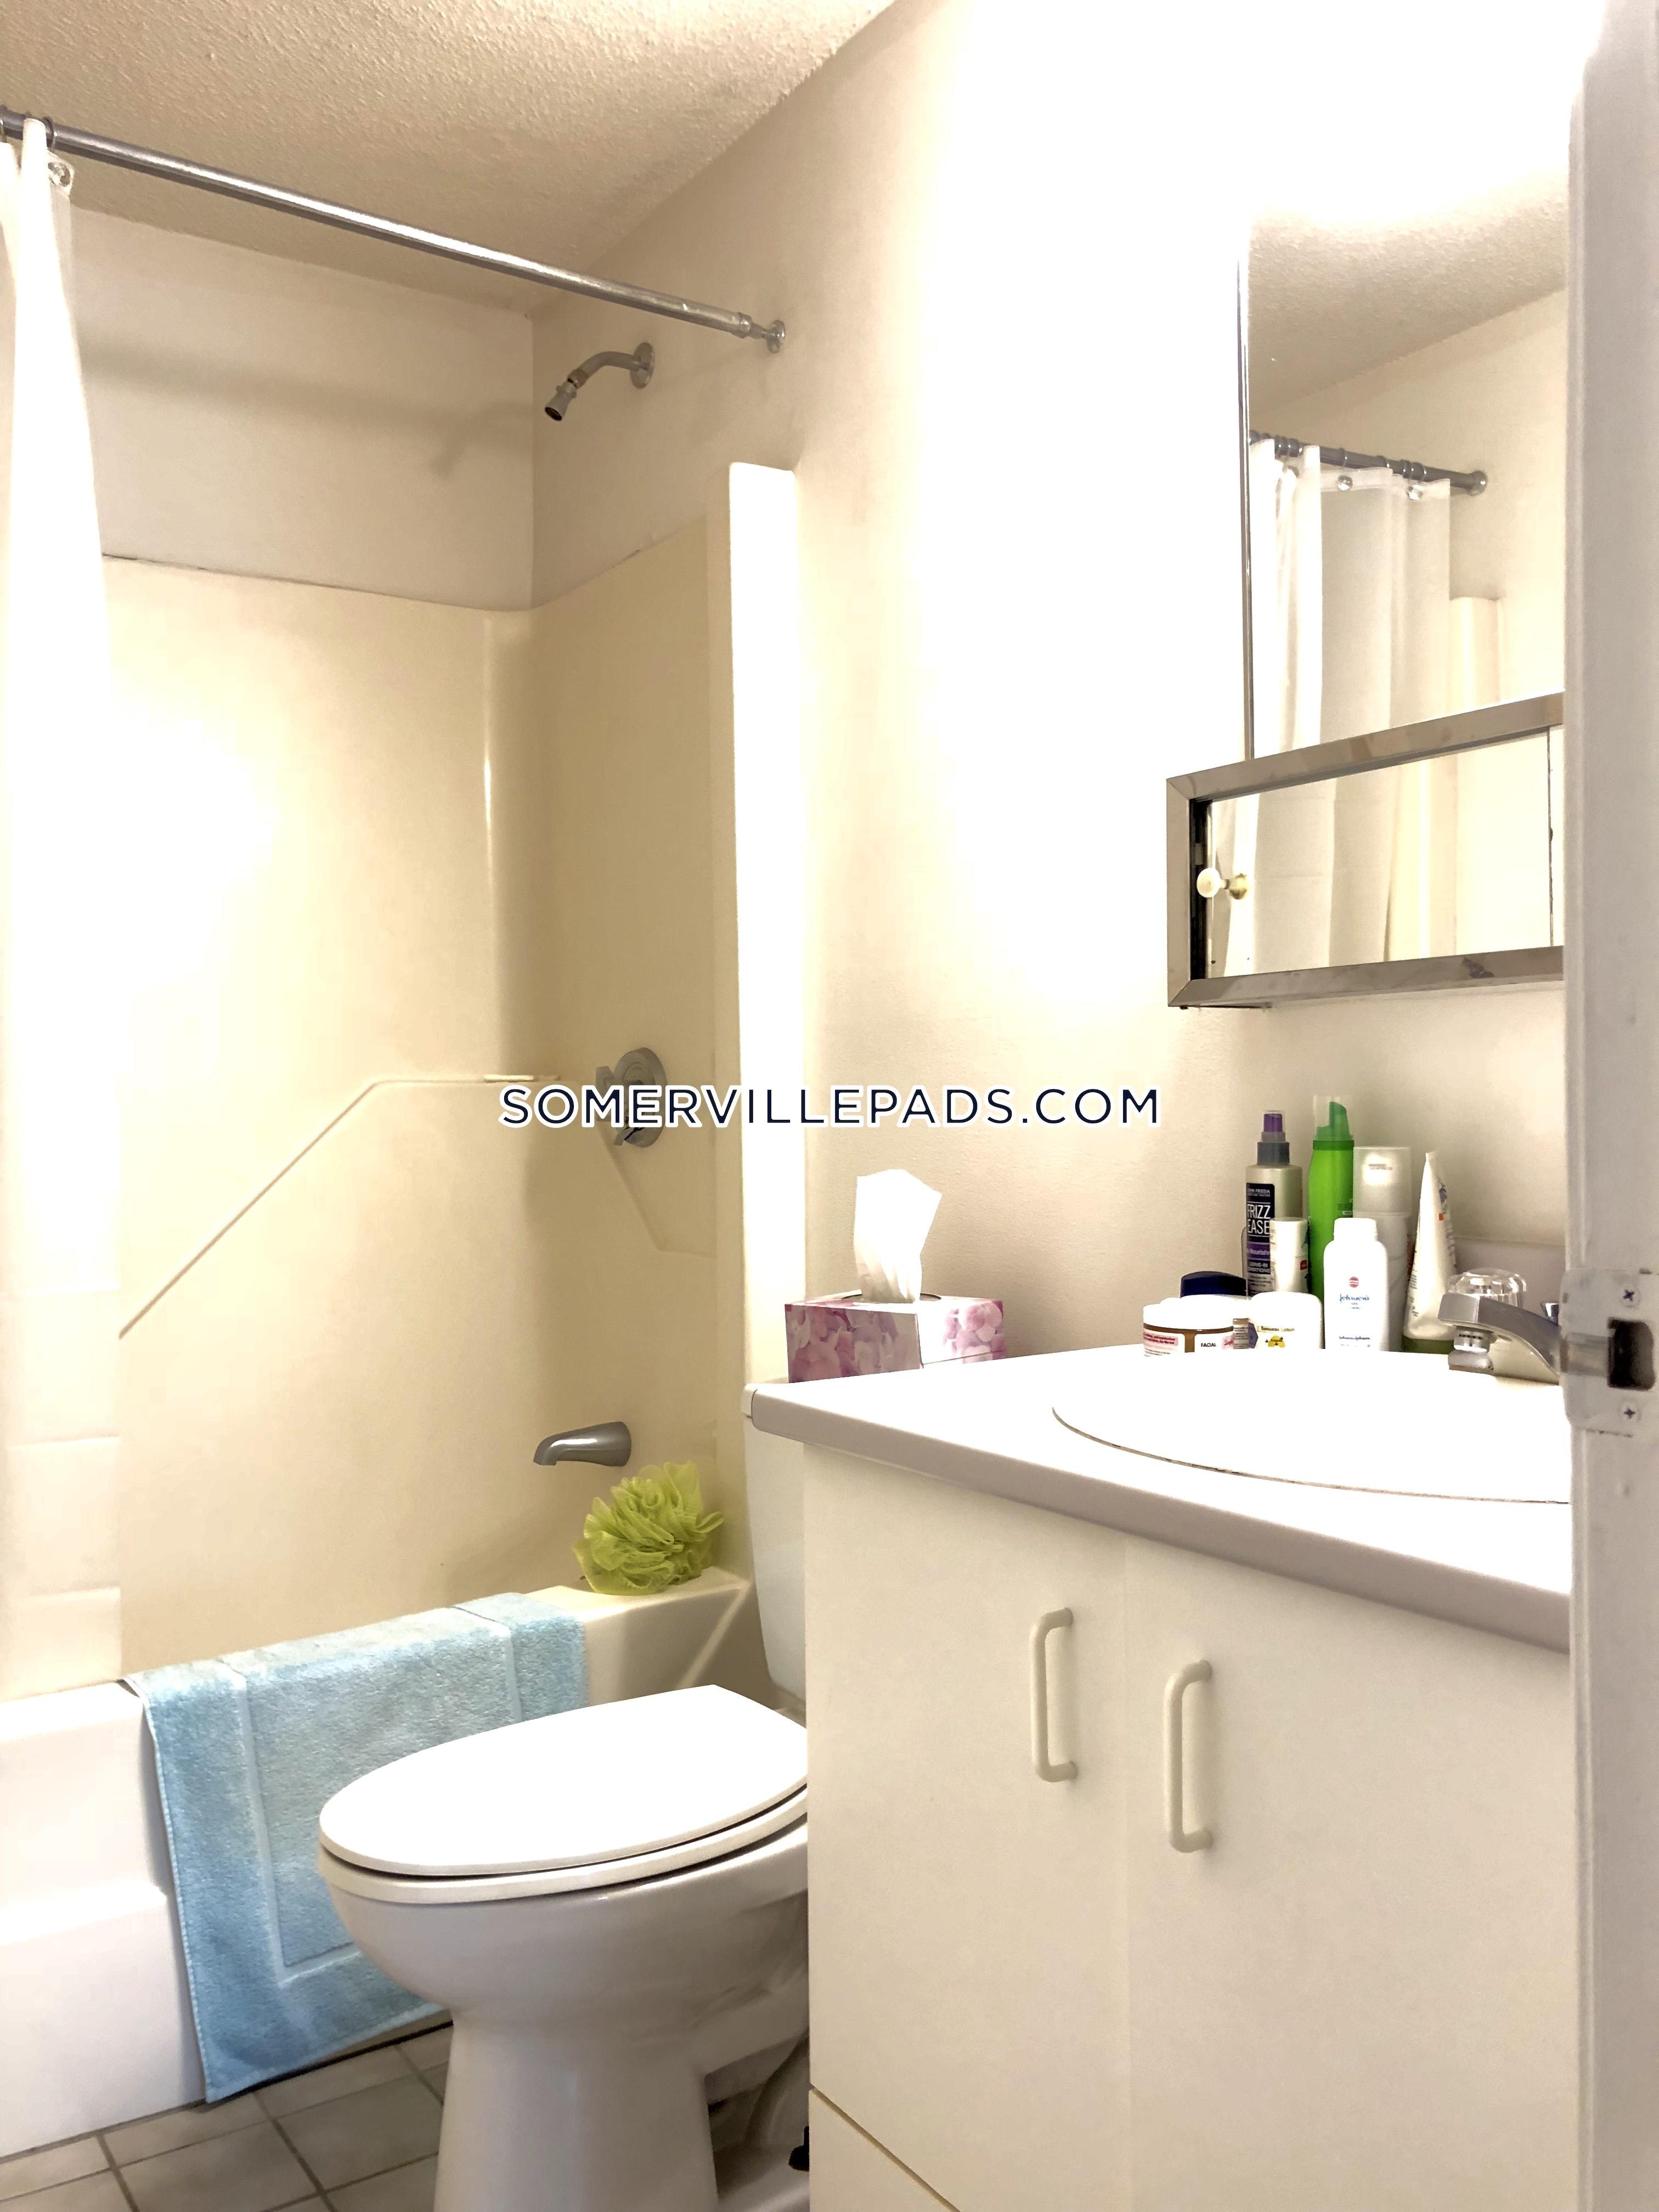 2-beds-2-baths-somerville-dali-inman-squares-2995-436672